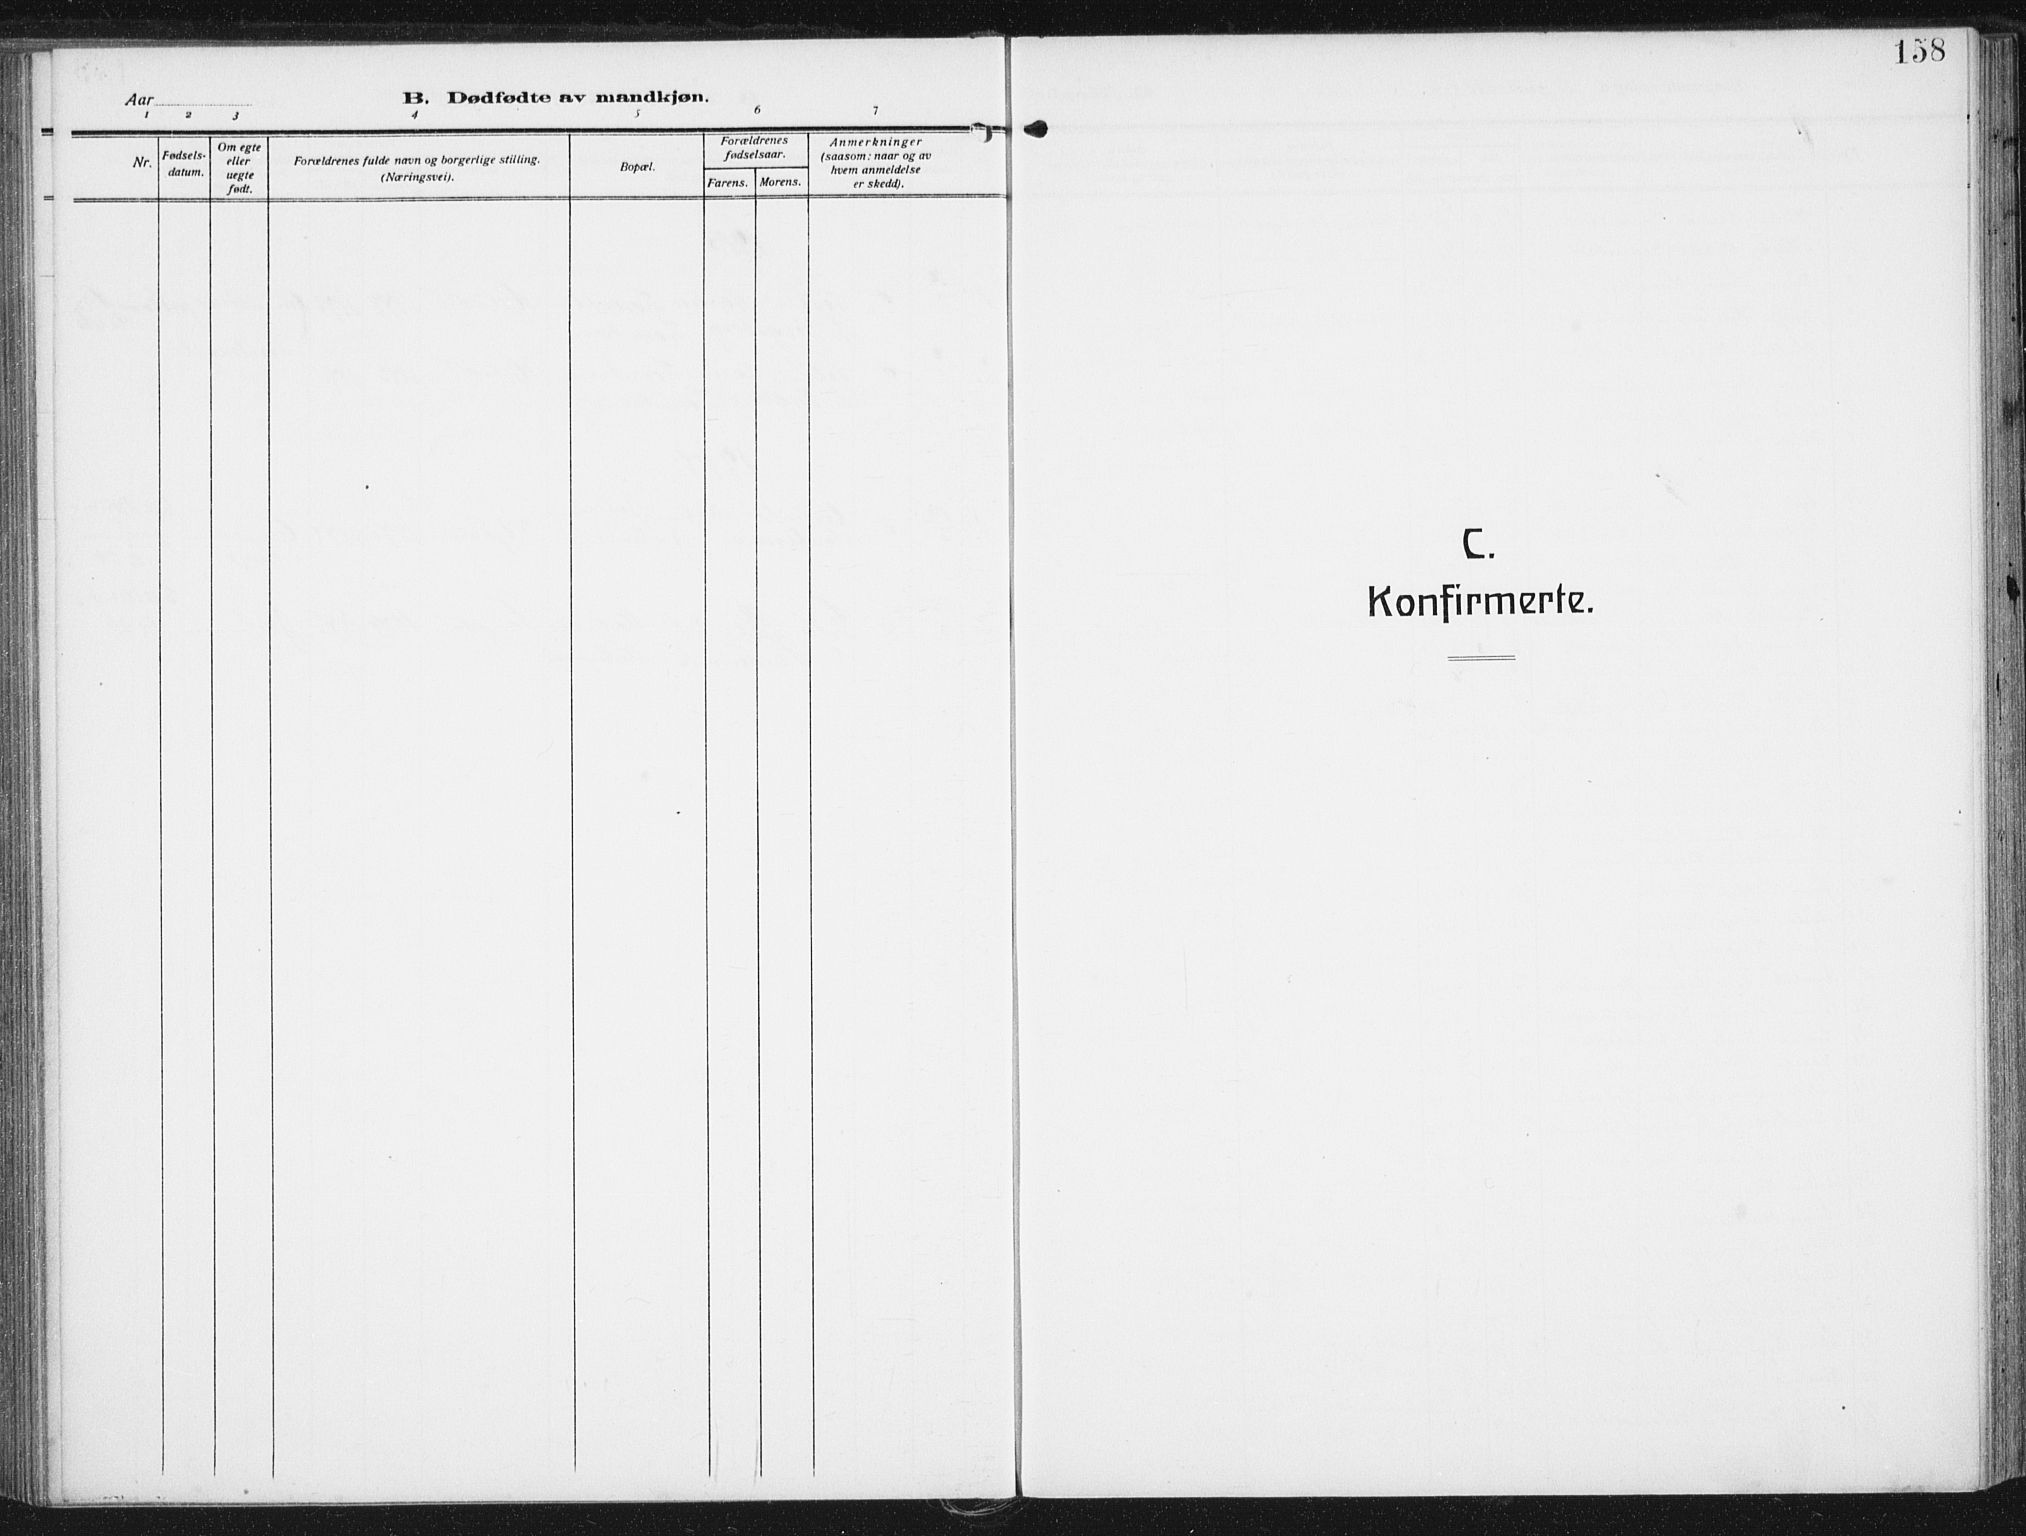 SAT, Ministerialprotokoller, klokkerbøker og fødselsregistre - Nordland, 880/L1135: Ministerialbok nr. 880A09, 1908-1919, s. 158